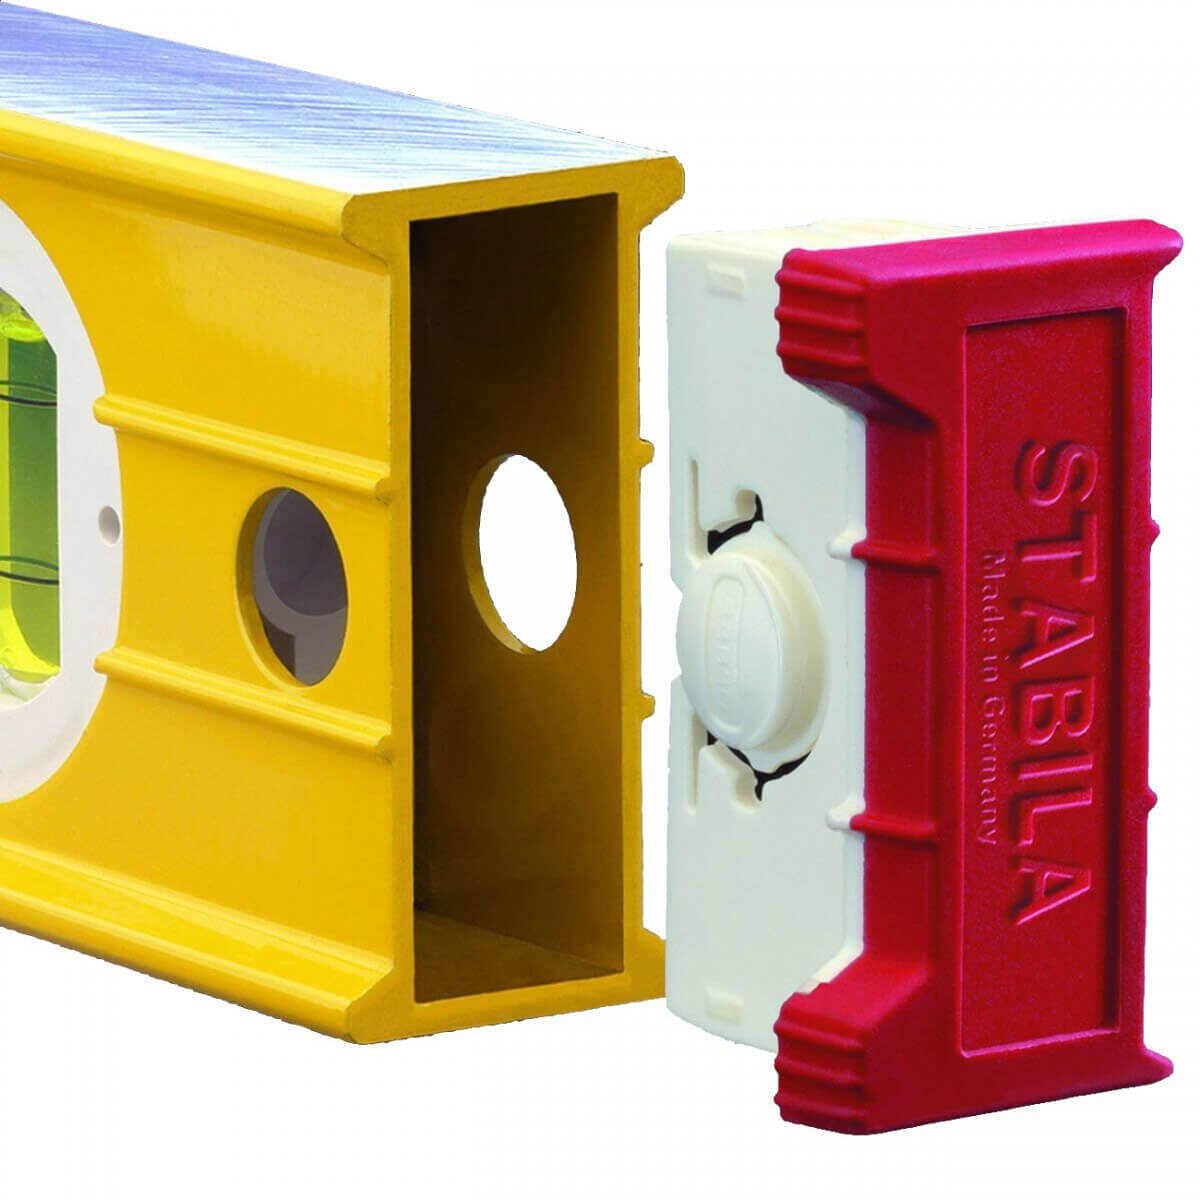 Stabila Type 196 Box Level